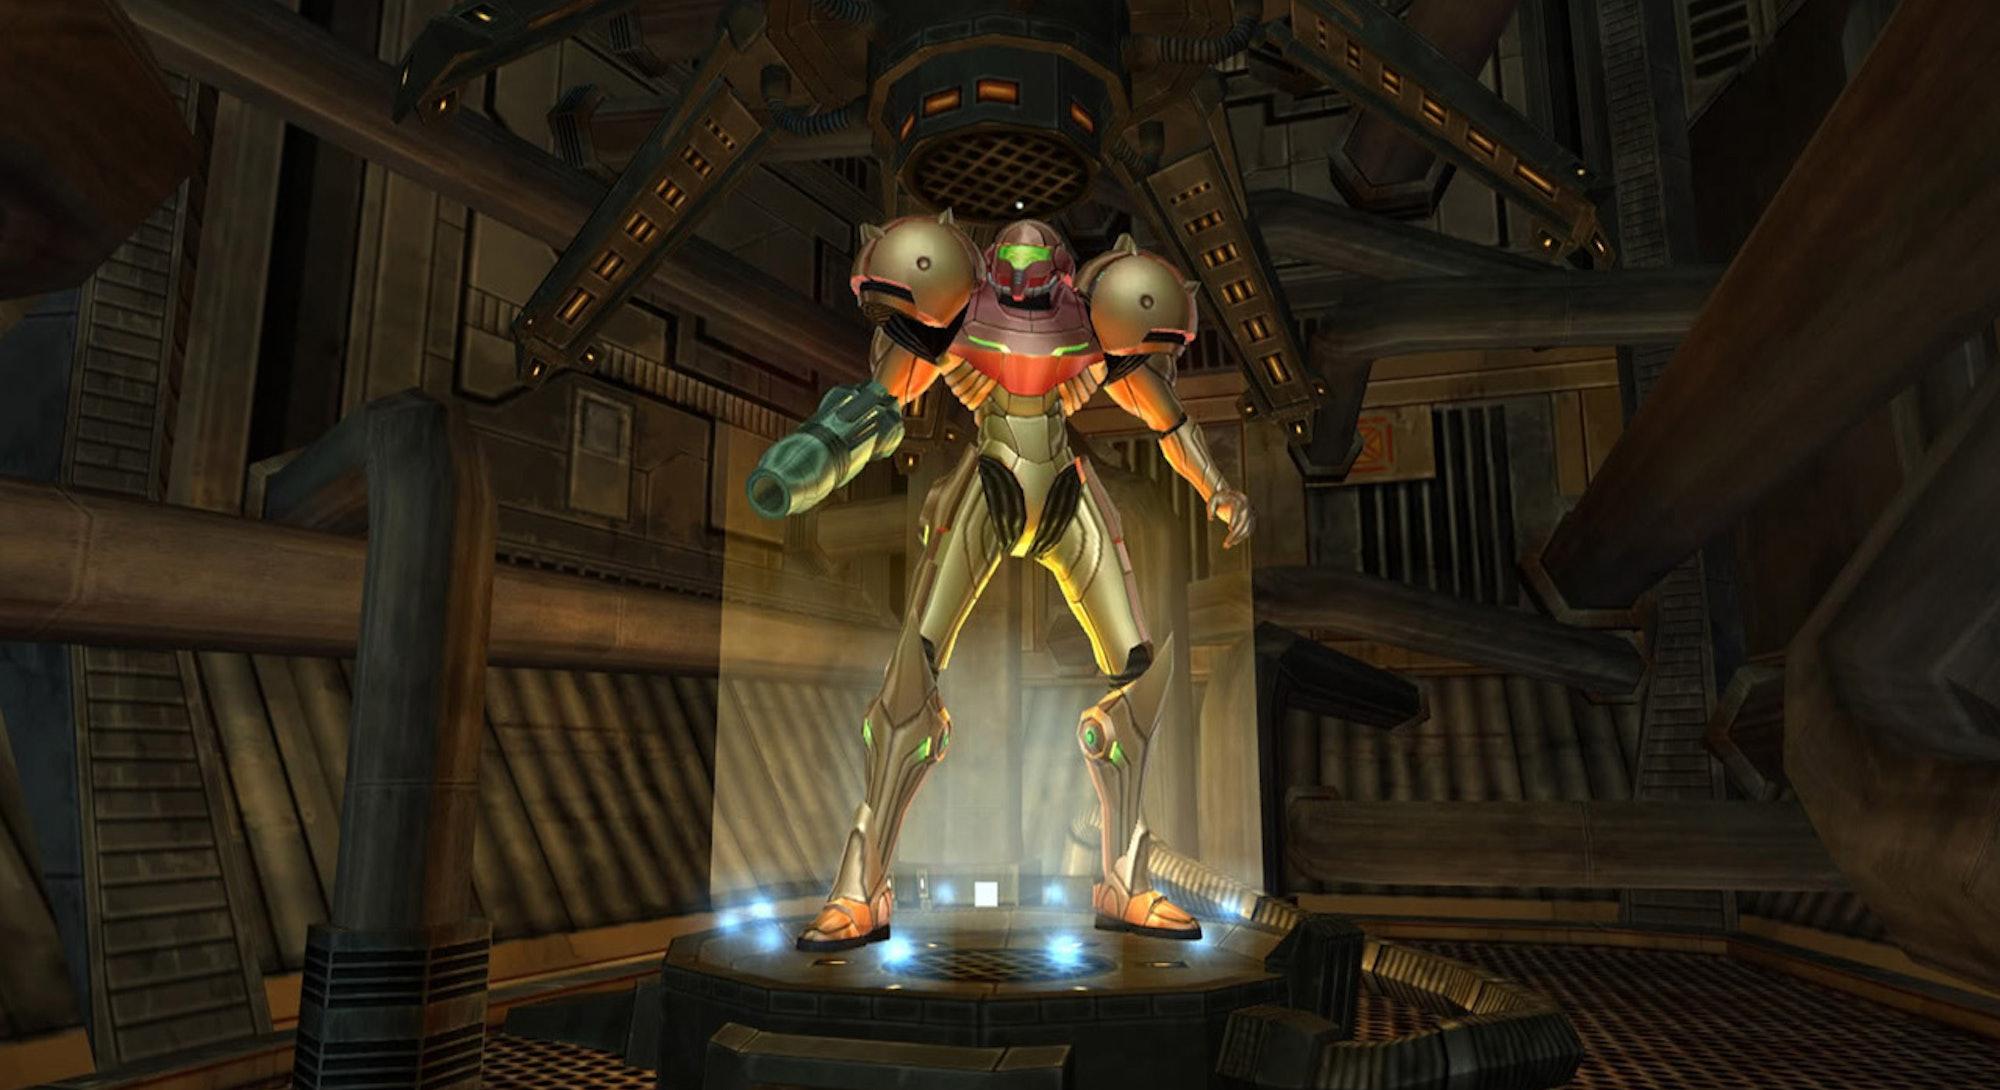 samus in armor from metroid prime